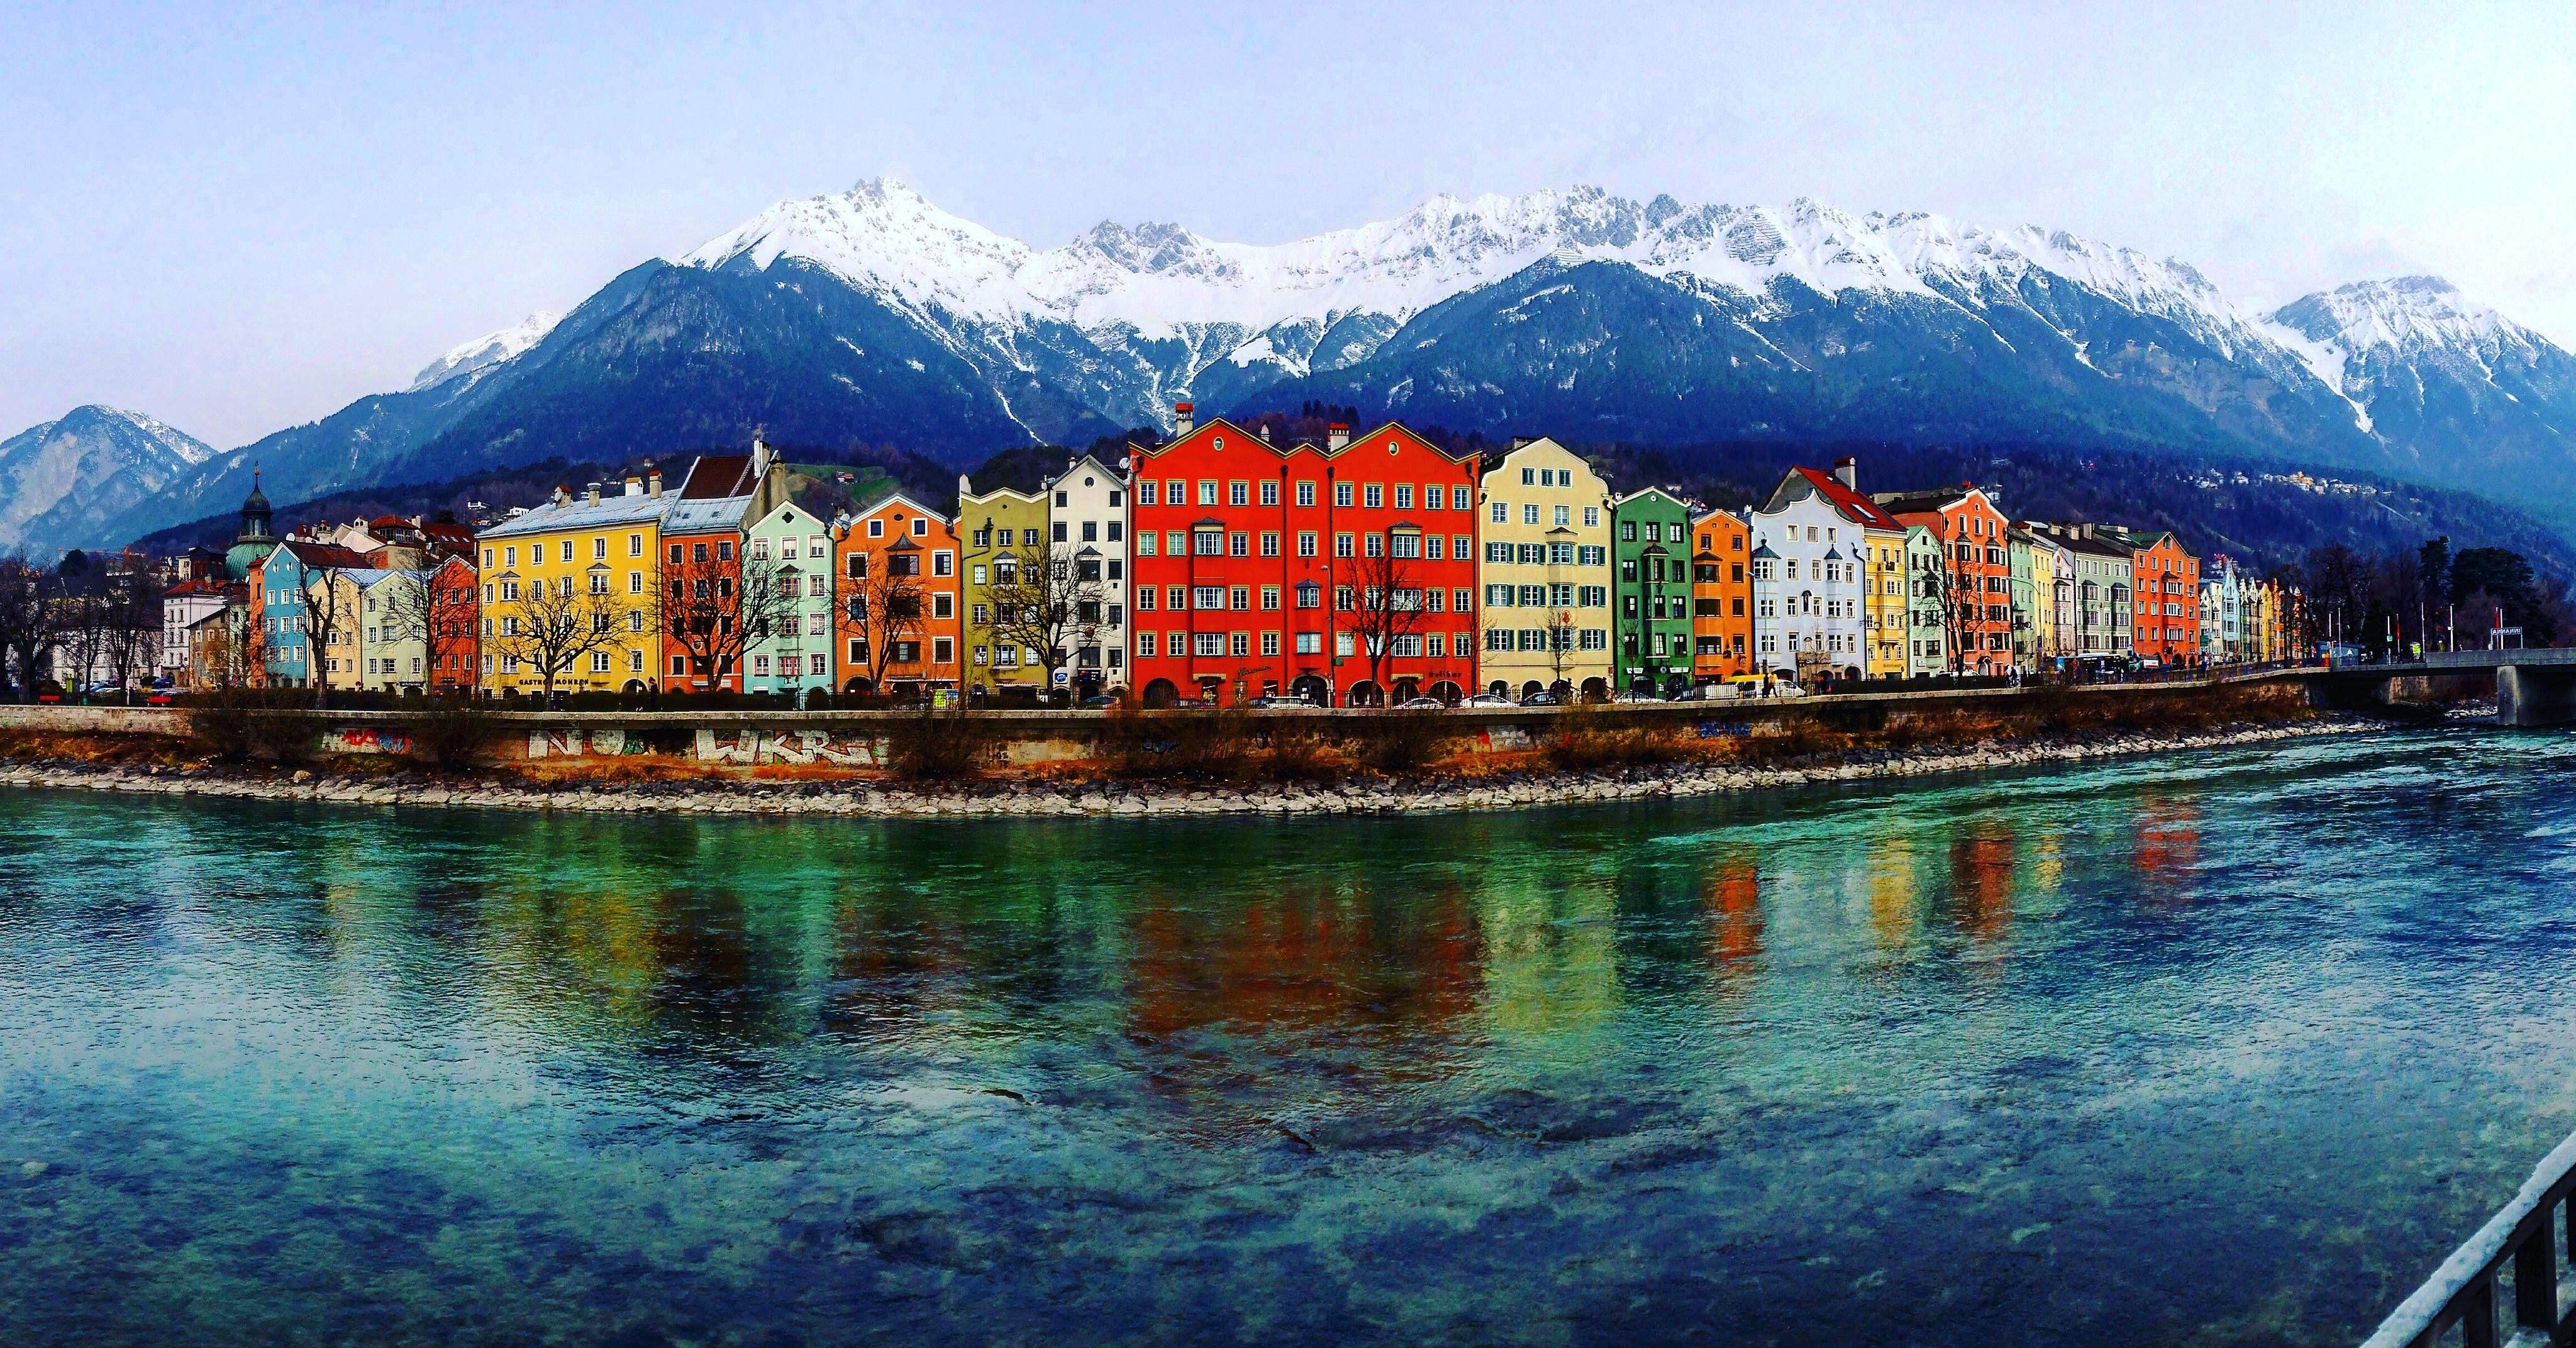 Innsbruck-Austria.jpg (4096×2144)